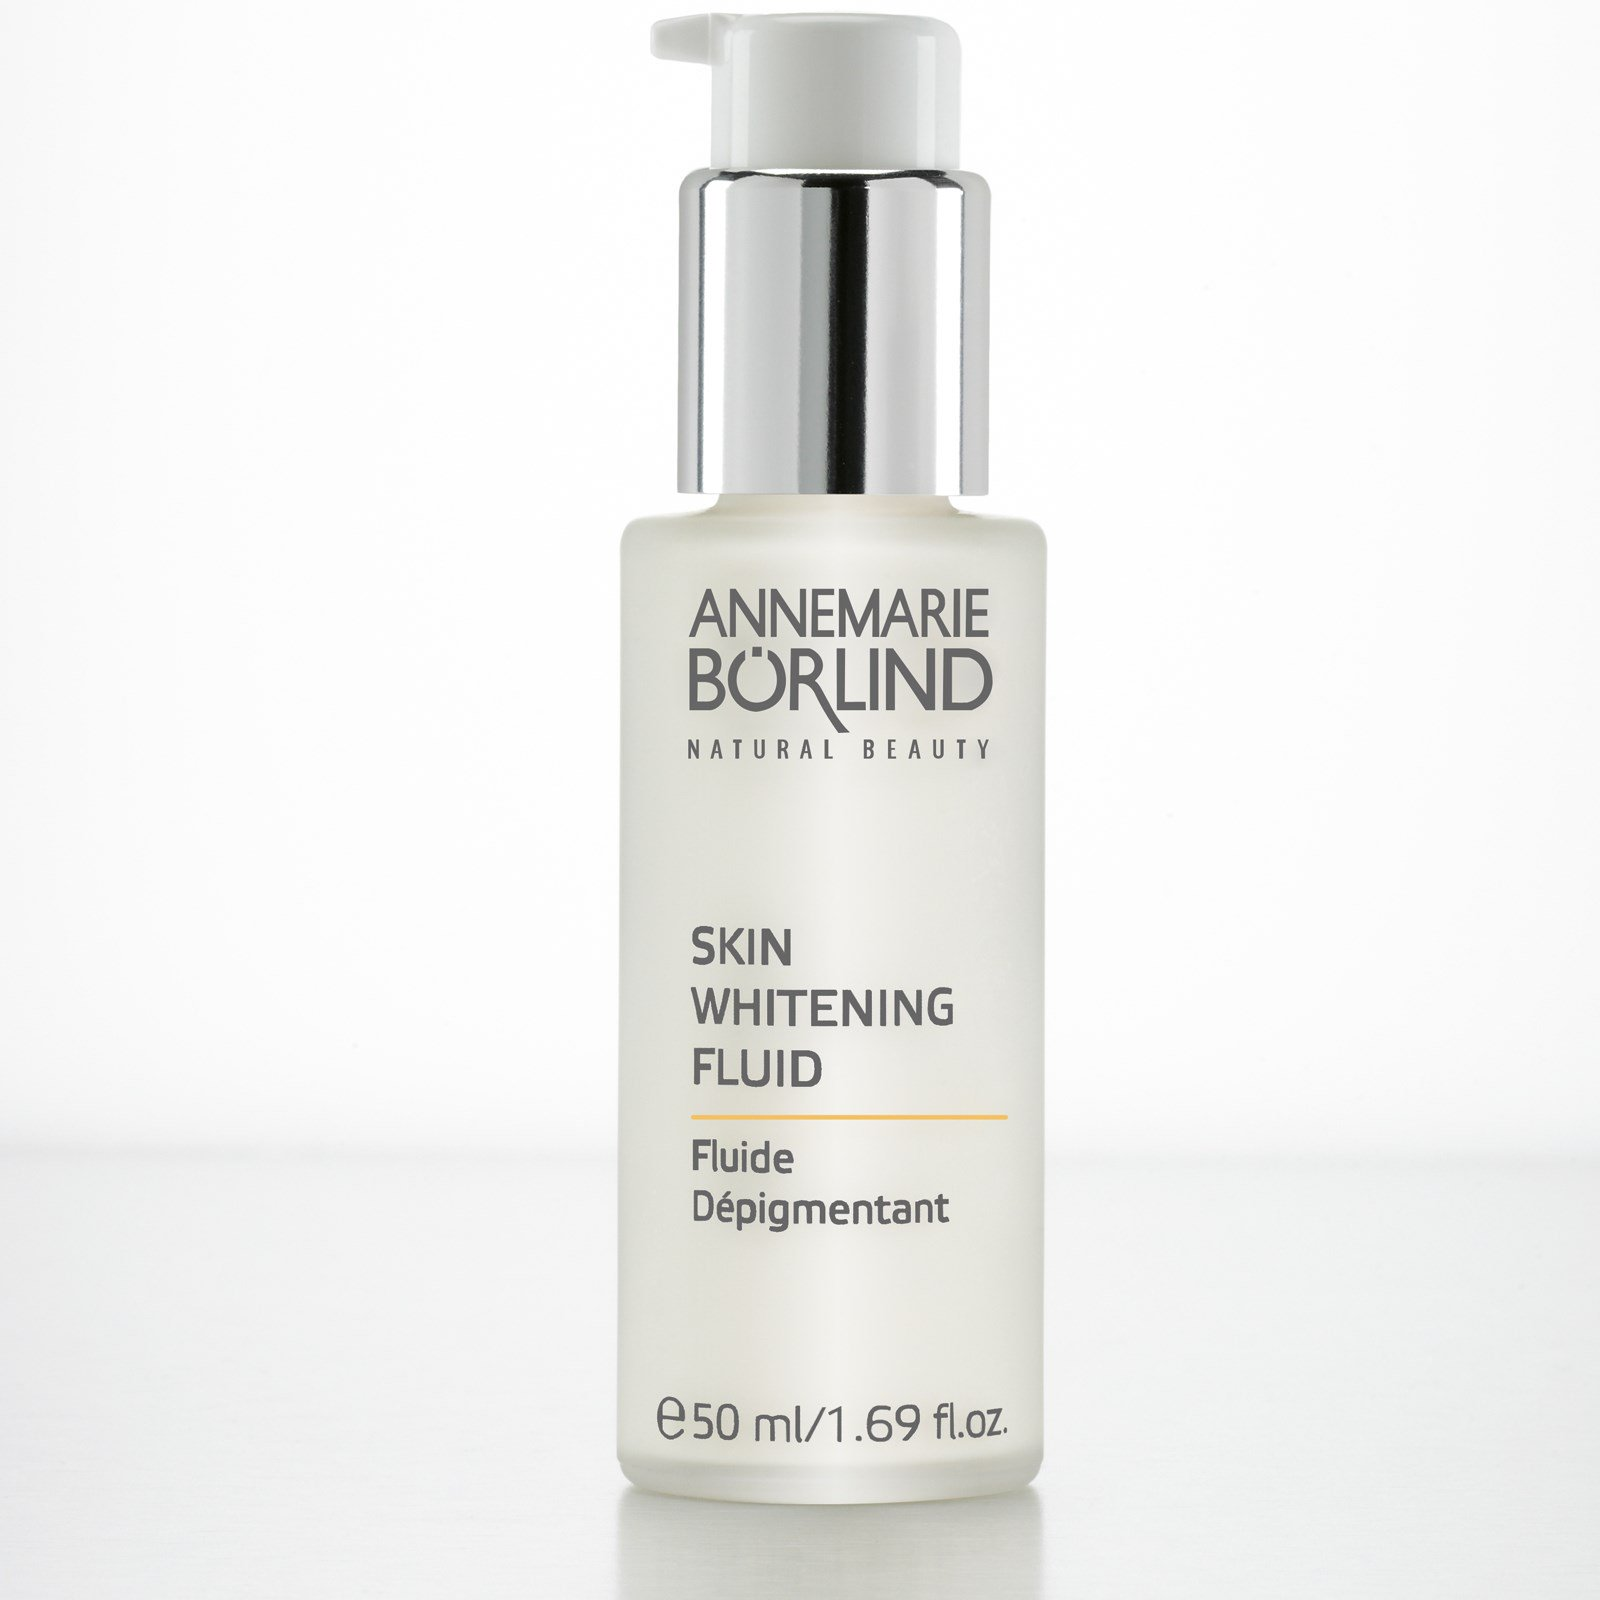 AnneMarie Borlind, Жидкость для отбеливания кожи 1.69 жидких унции (50 мл)